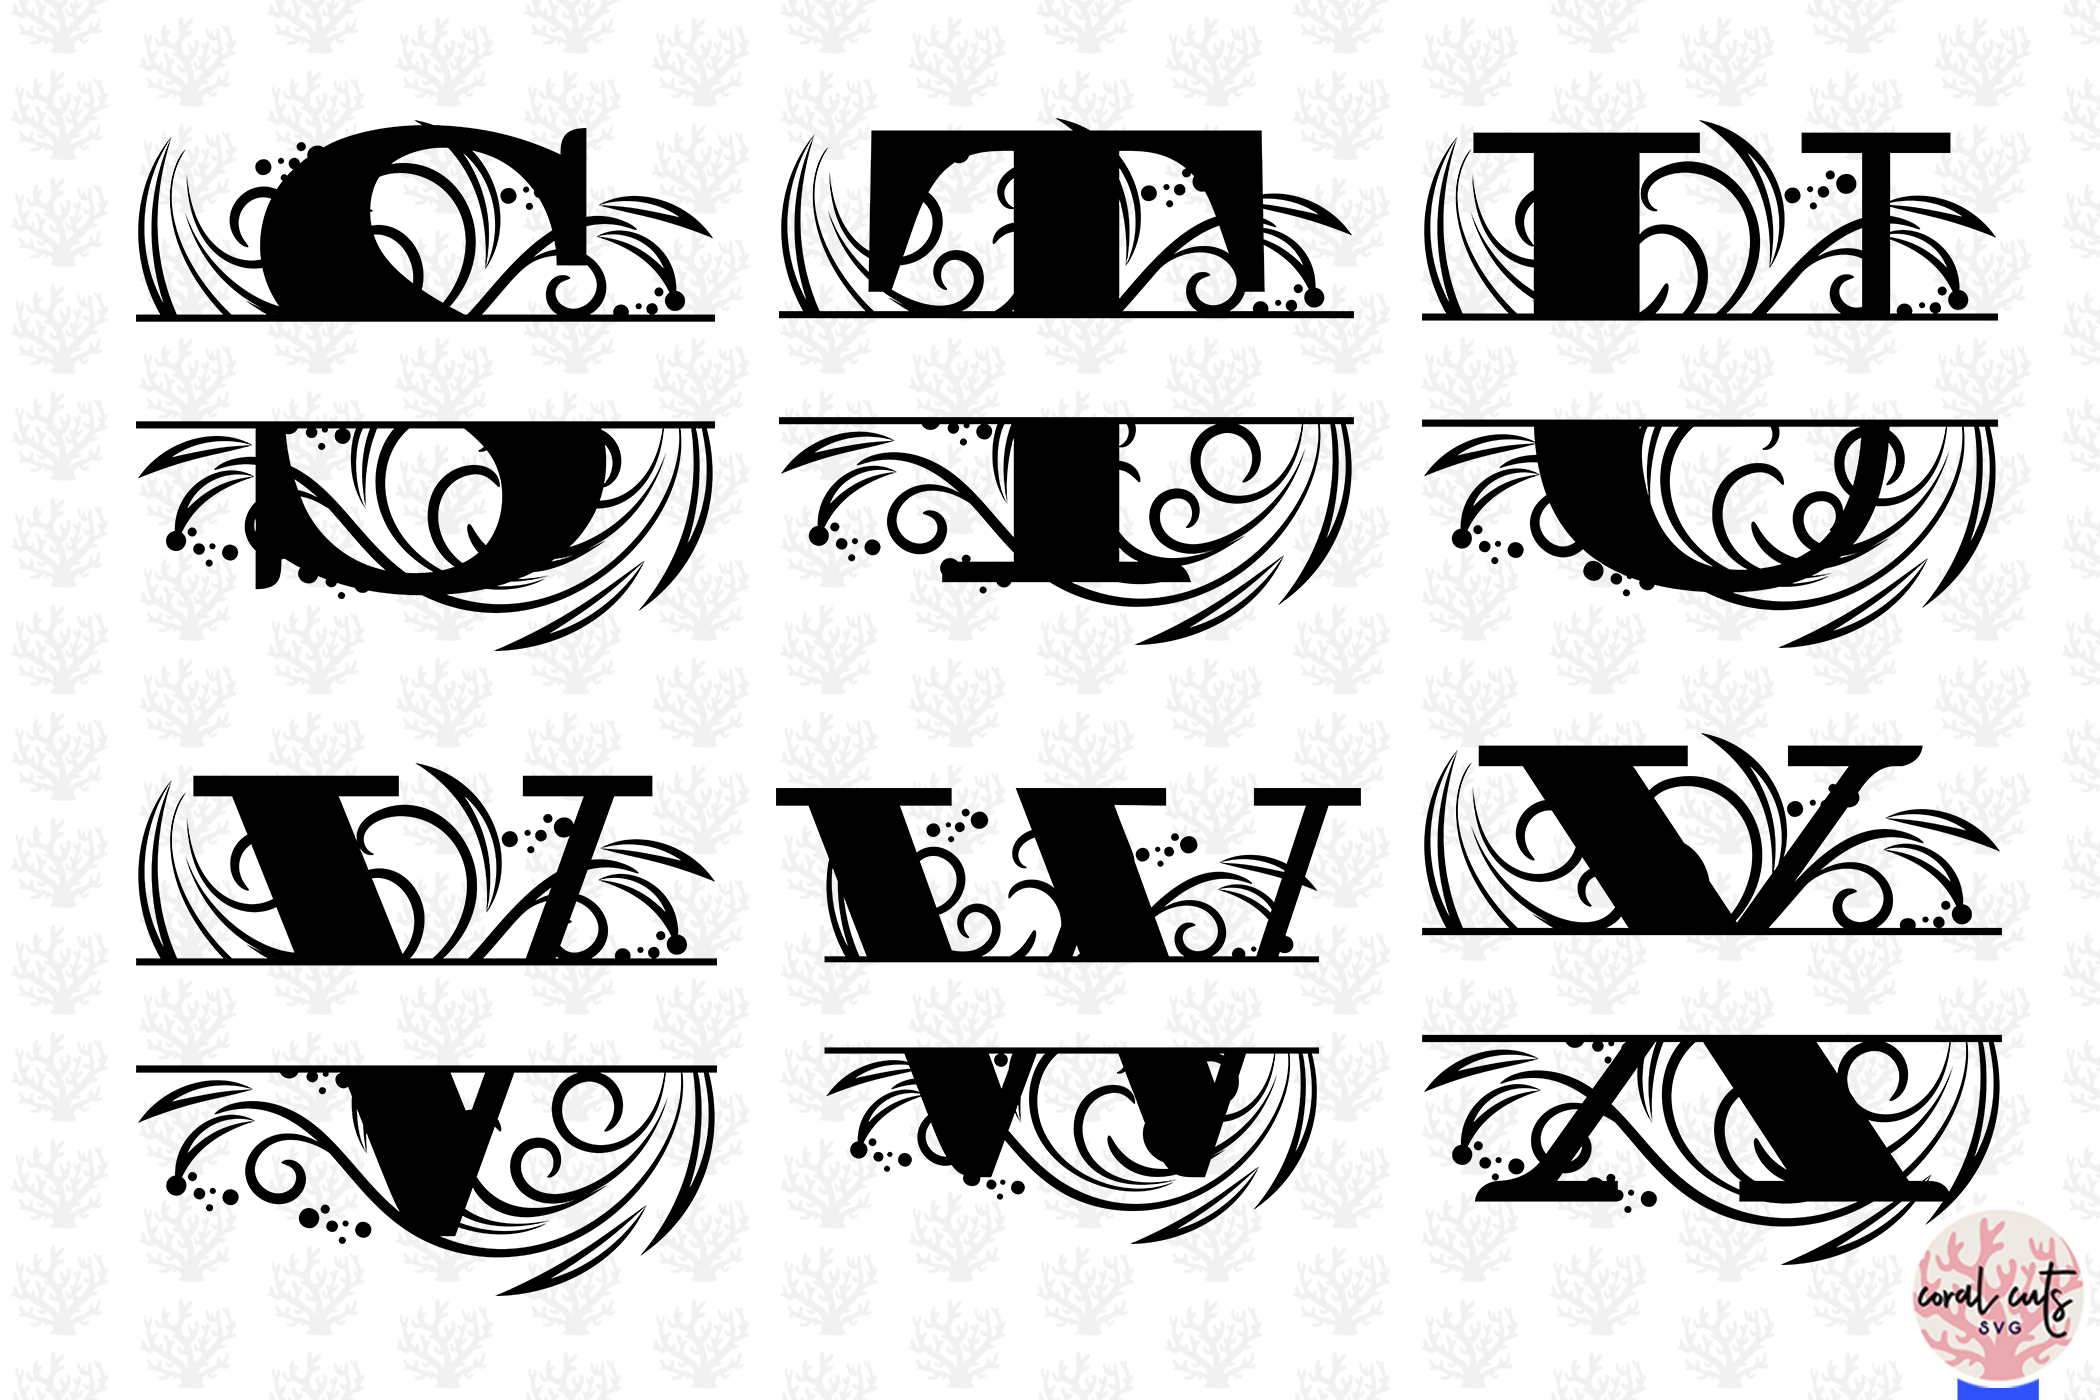 Floral Split Monogram Cut Files - Svg EPS DXF PNG File example image 5